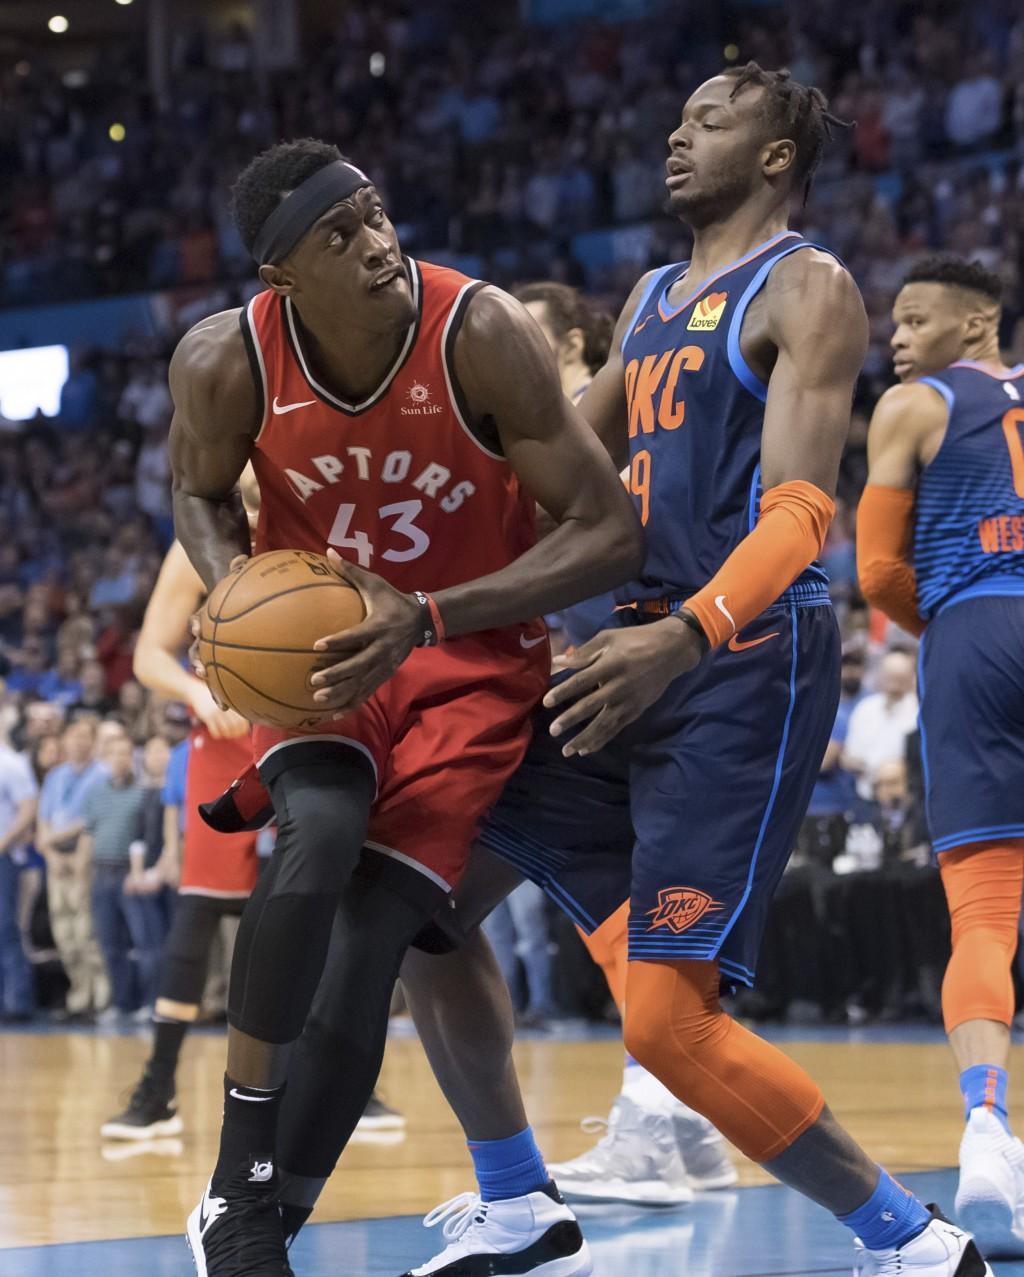 Toronto Raptors forward Pascal Siakam (43) bumps against Oklahoma City Thunder forward Jerami Grant (9) during the first half of an NBA basketball gam...